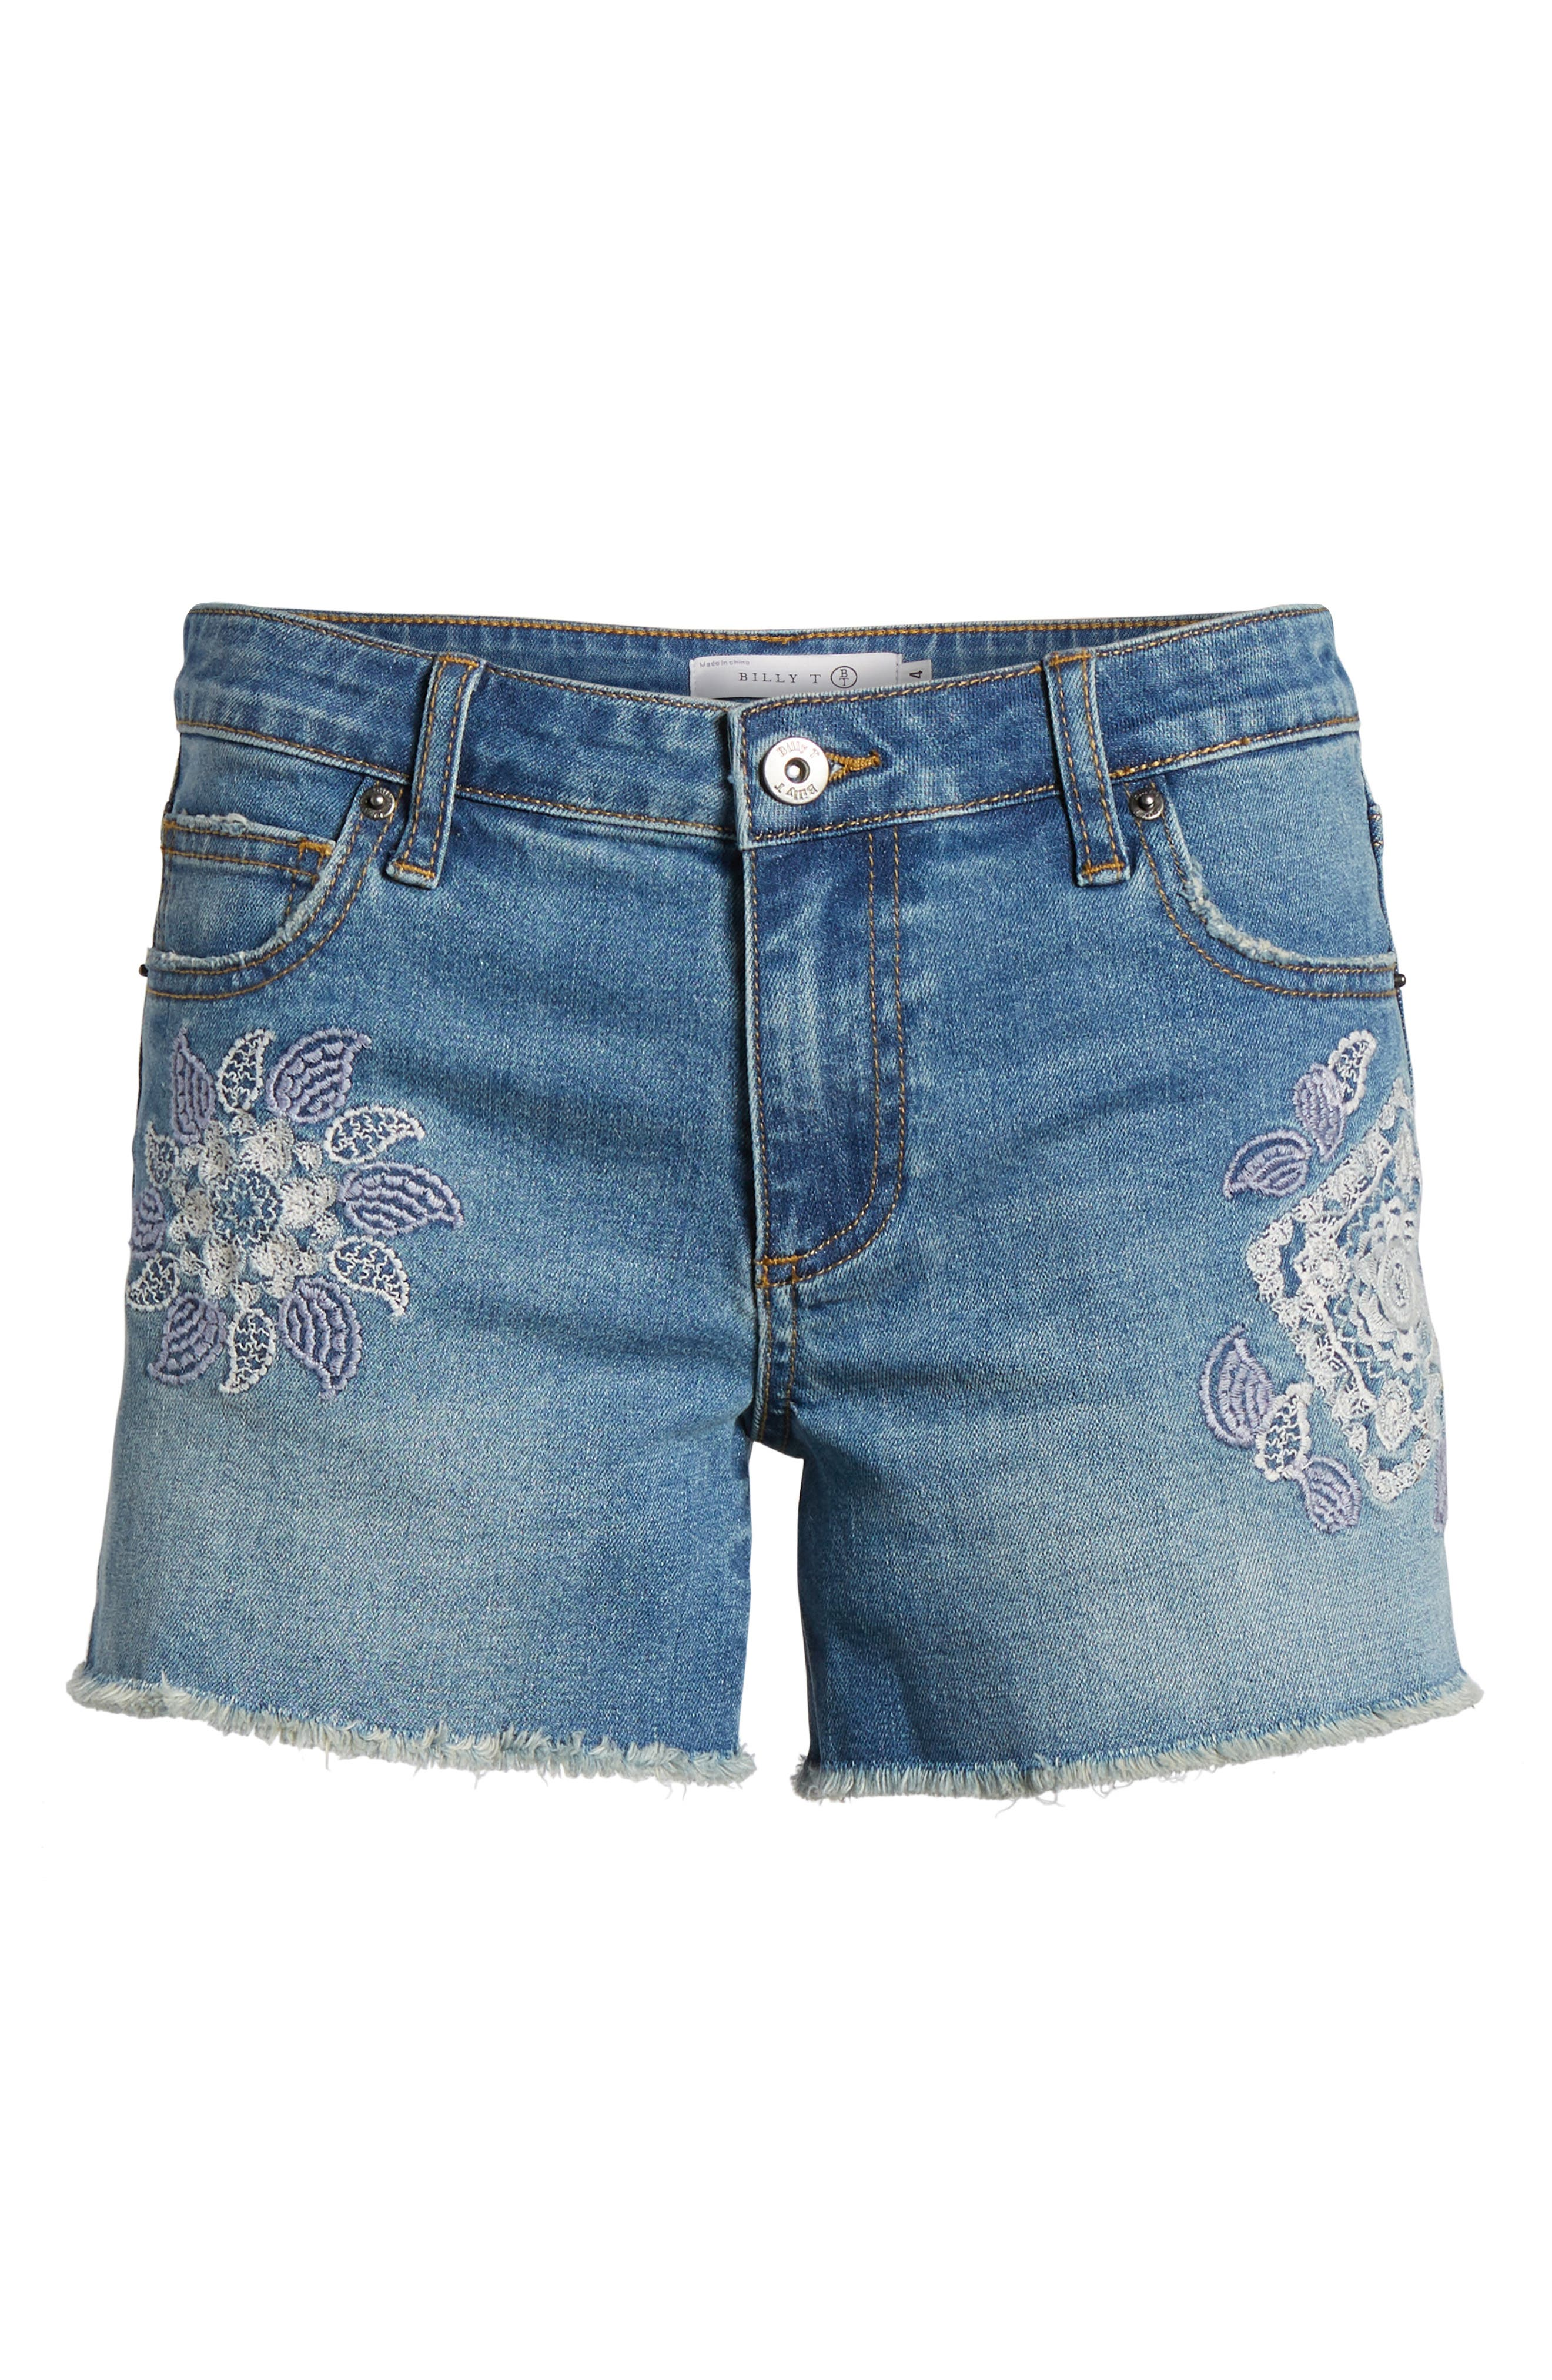 Embroidered Denim Shorts,                             Alternate thumbnail 13, color,